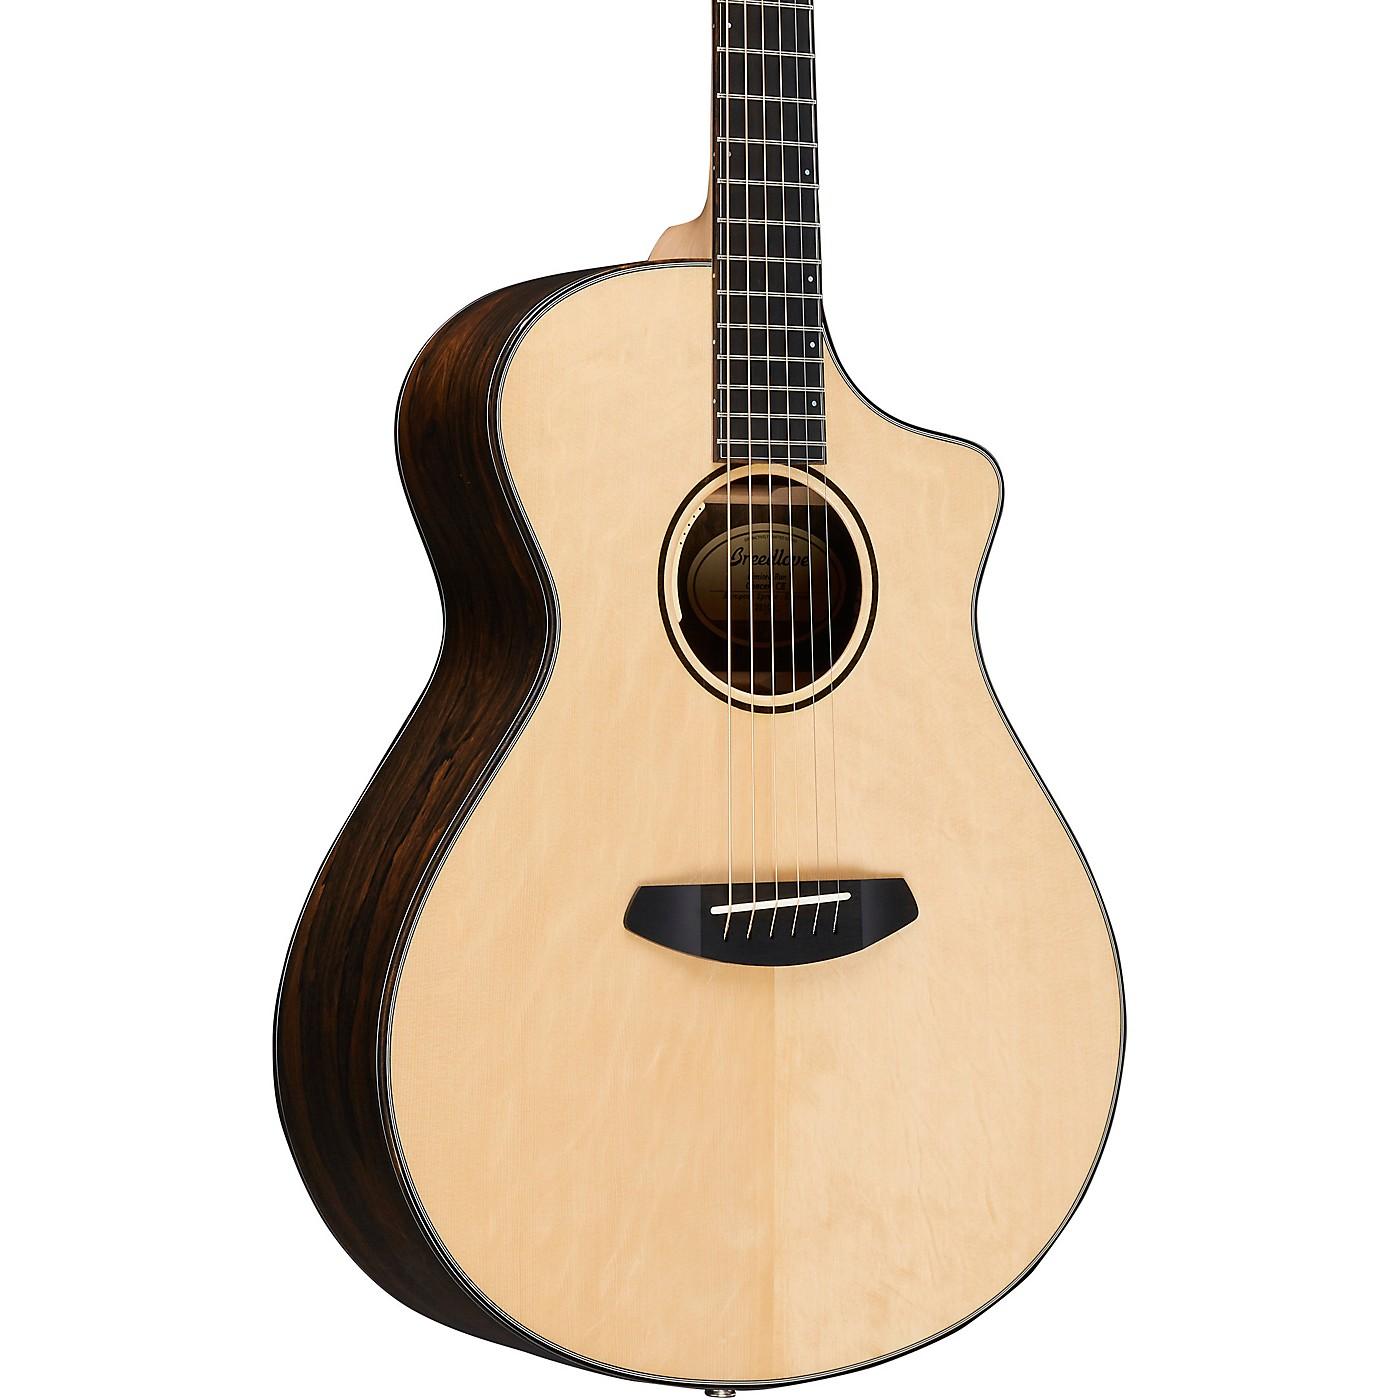 Breedlove Limited Run Concert CE European Spruce-Ziricote Acoustic-Electric Guitar thumbnail